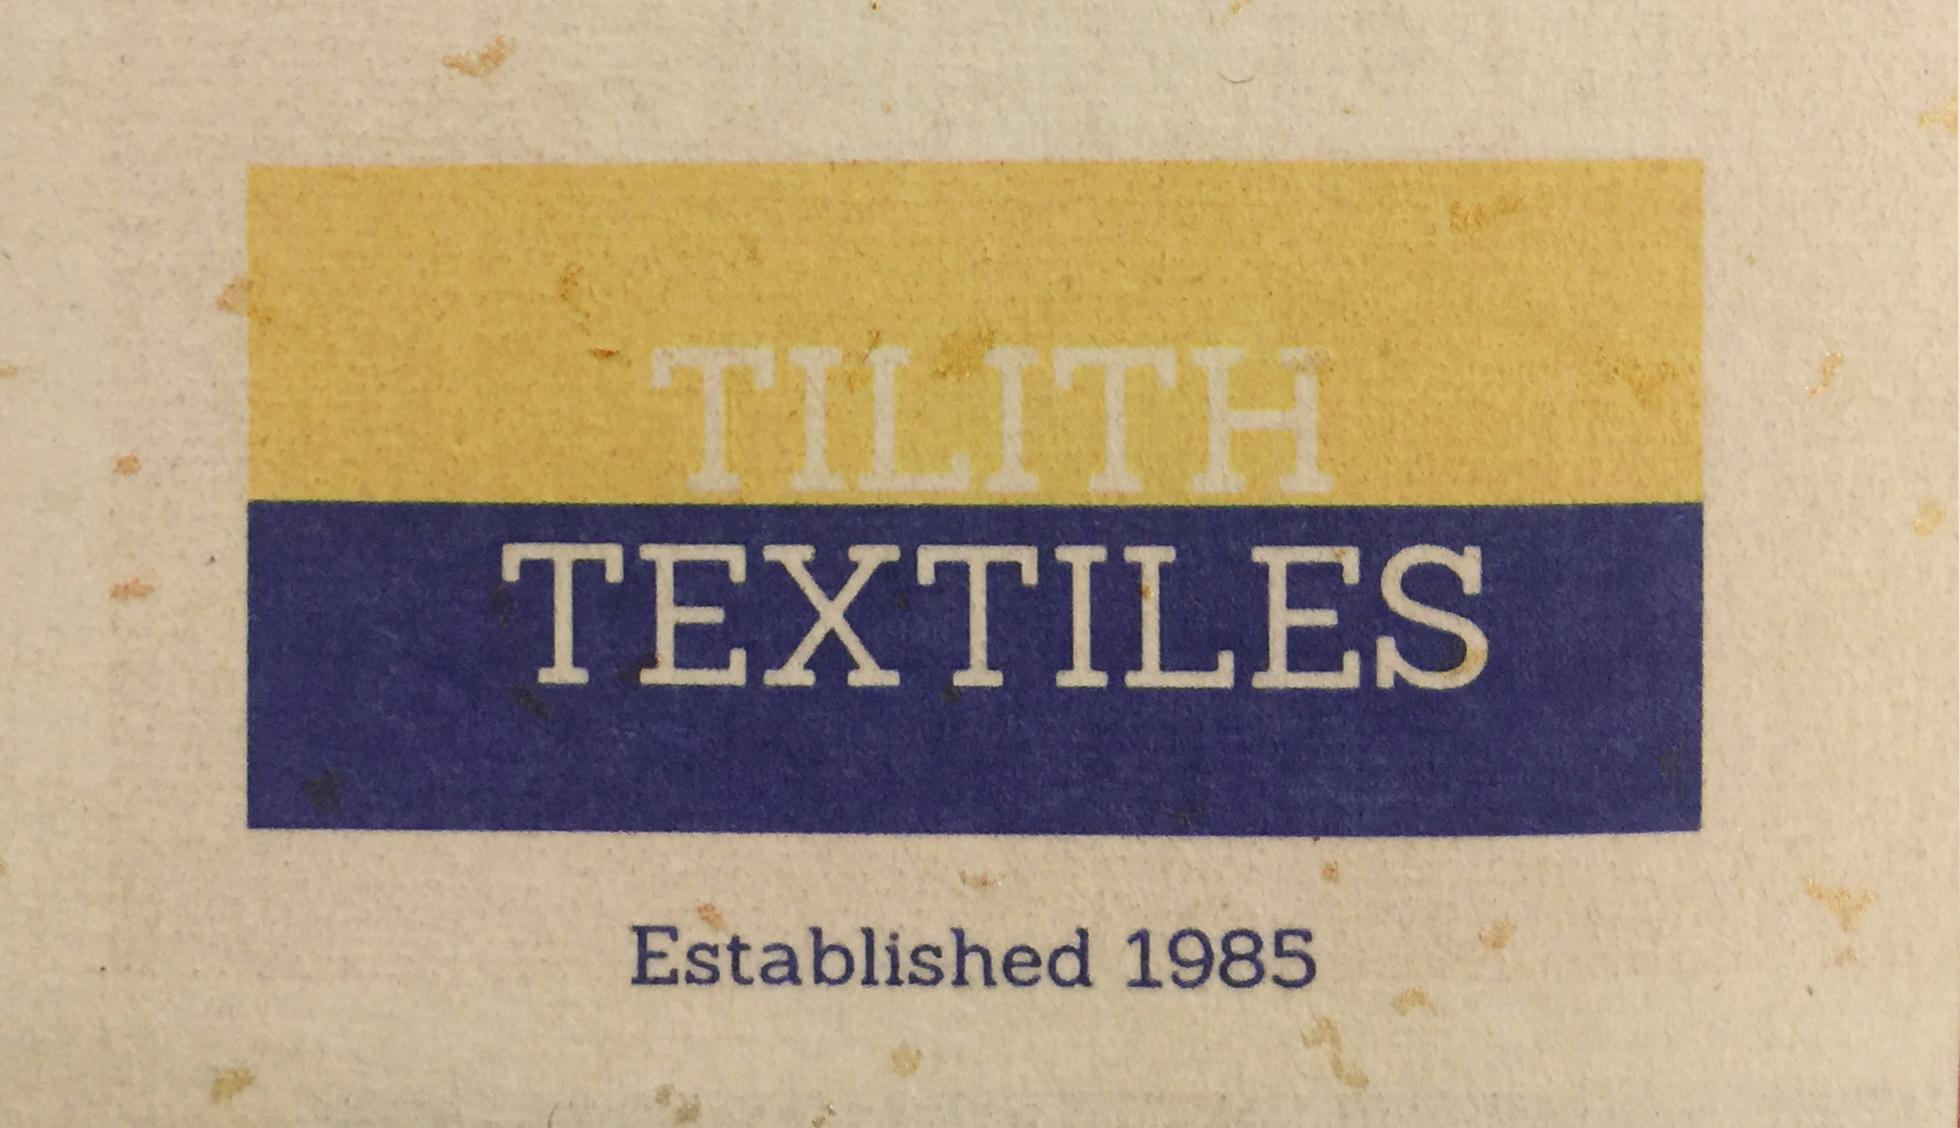 tilith textiles